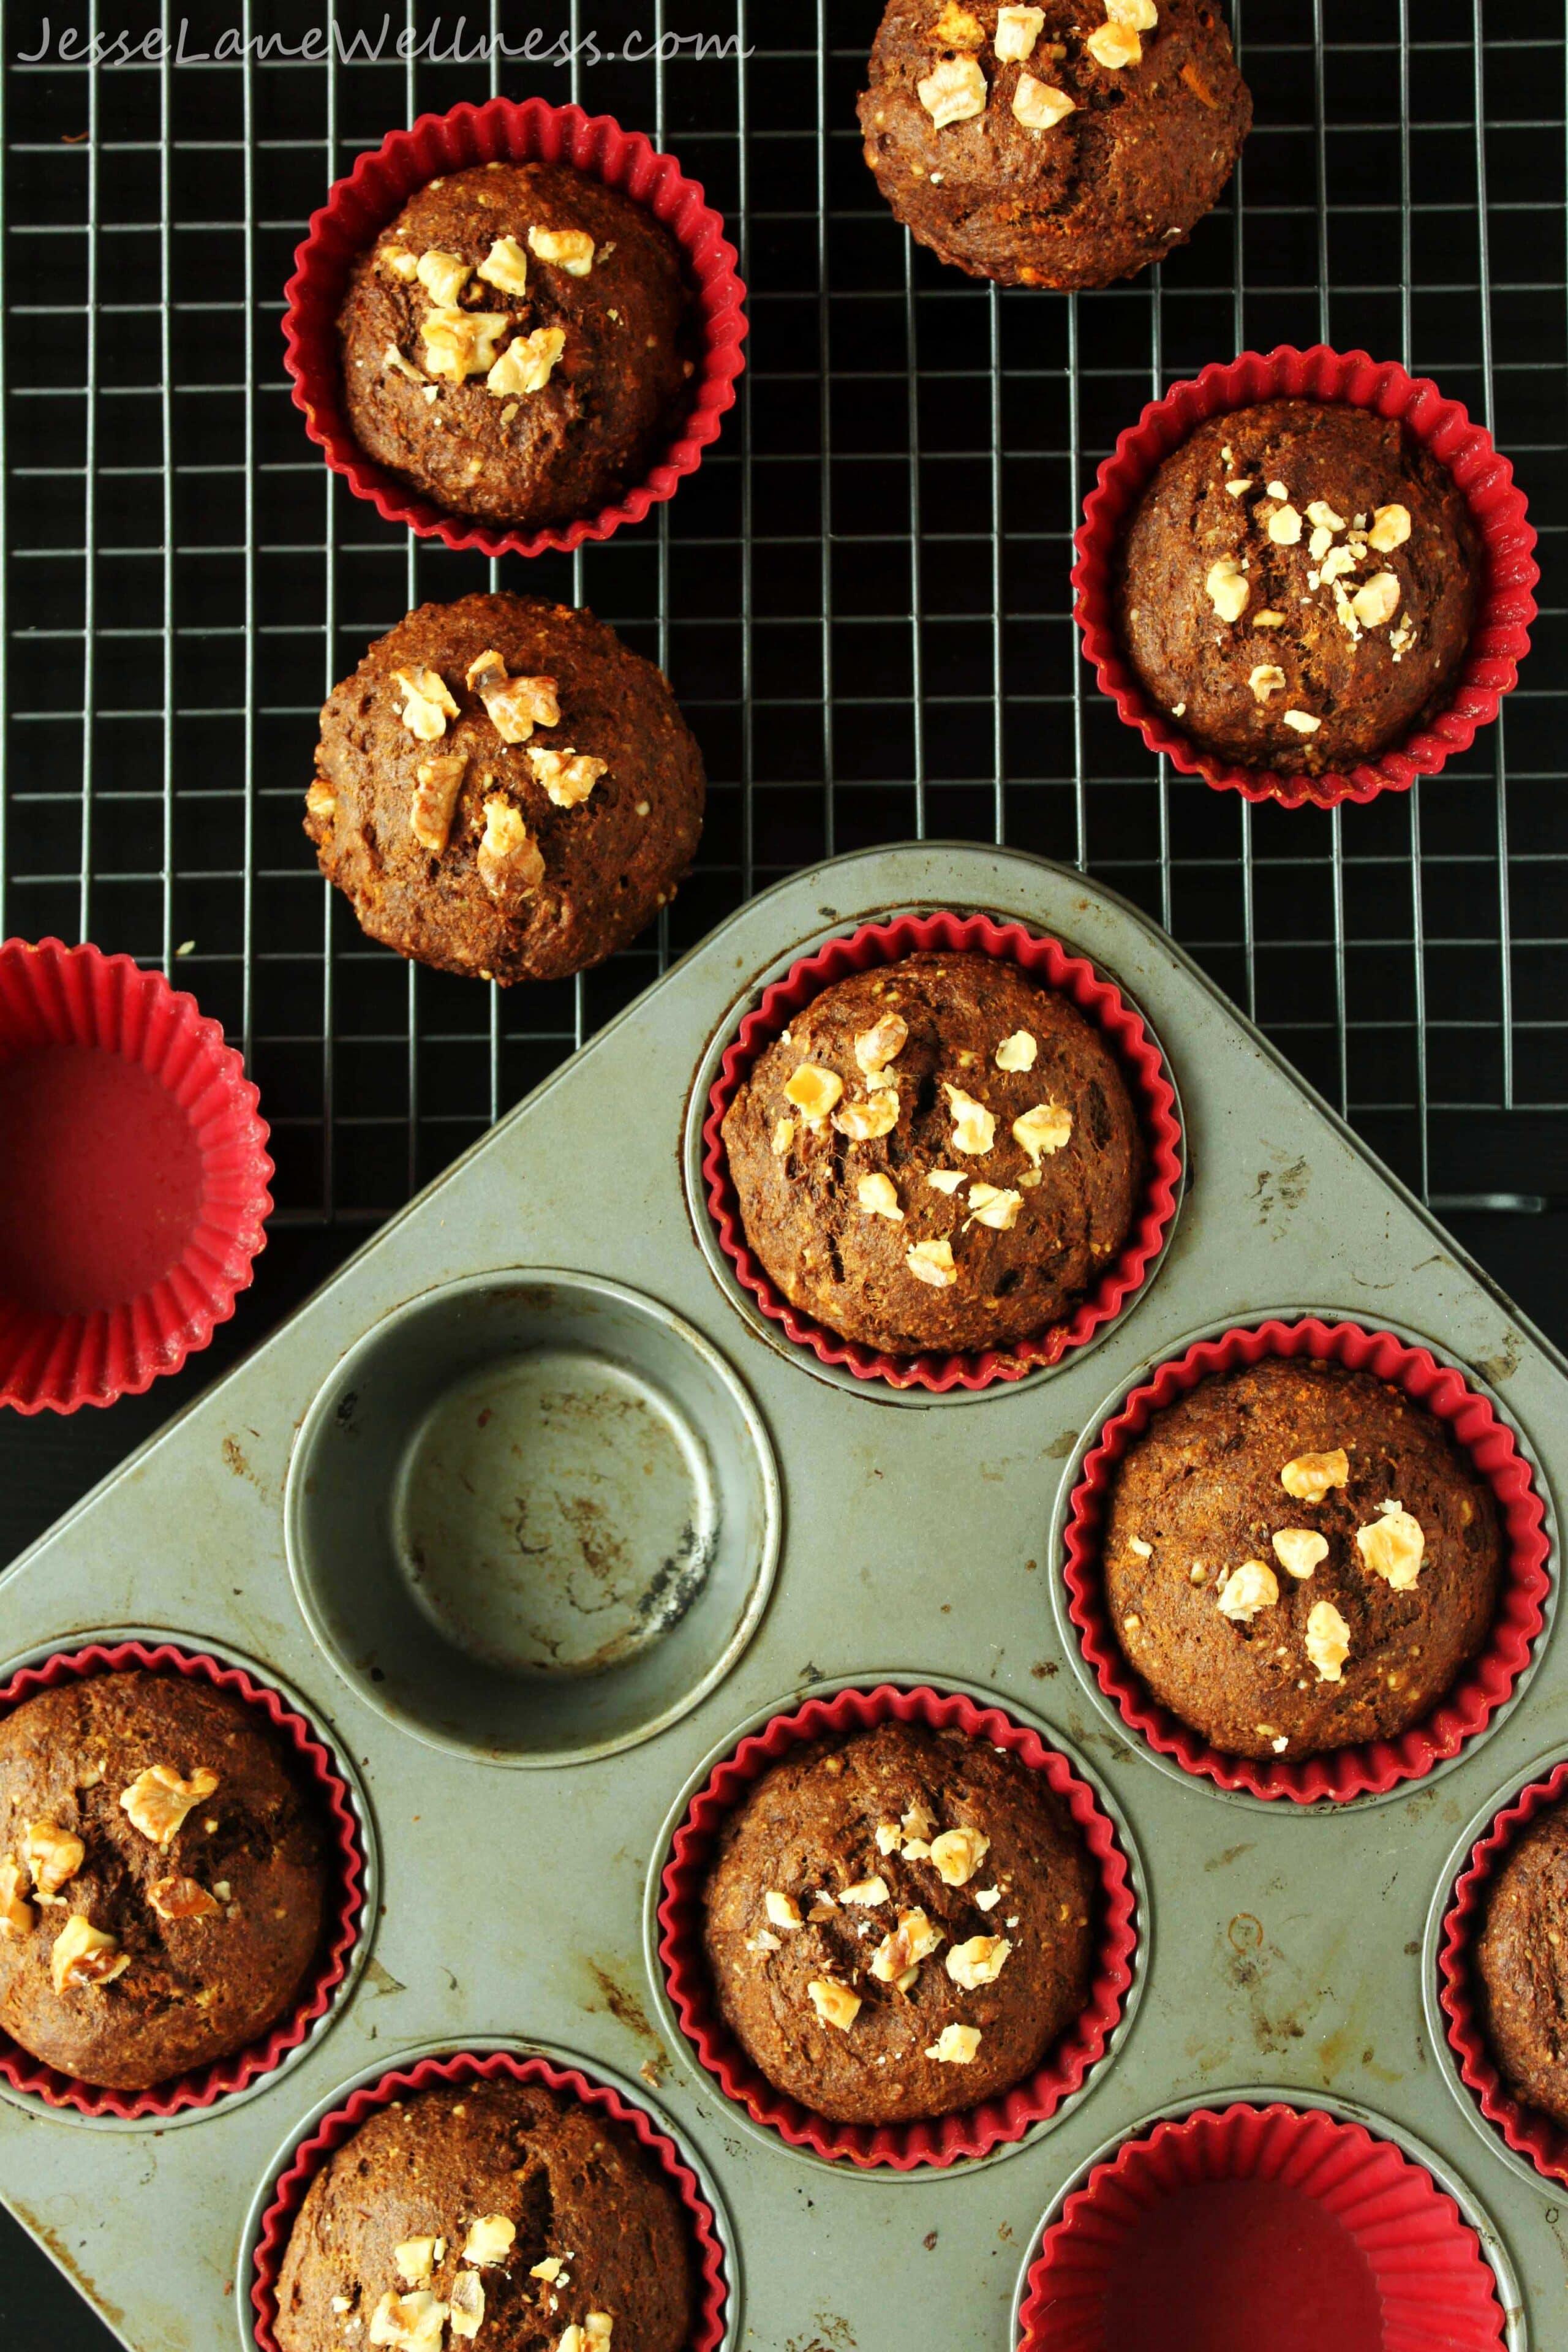 Vegan Carrot Molasses Muffins by @JesseLWellness #muffins #carrot